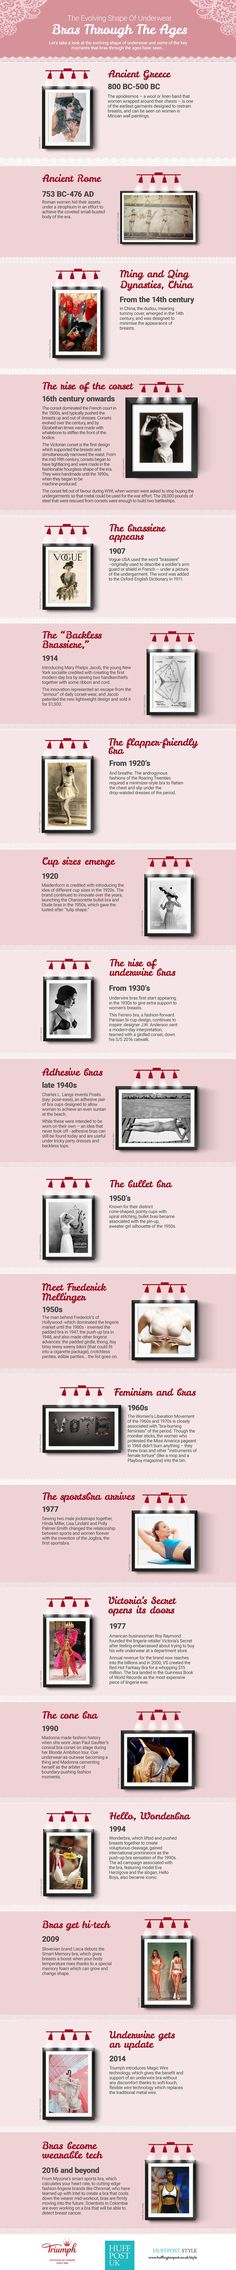 Evolution of the Bra - Brassiere History Infographic #women #fashion #history #vintage #underwear